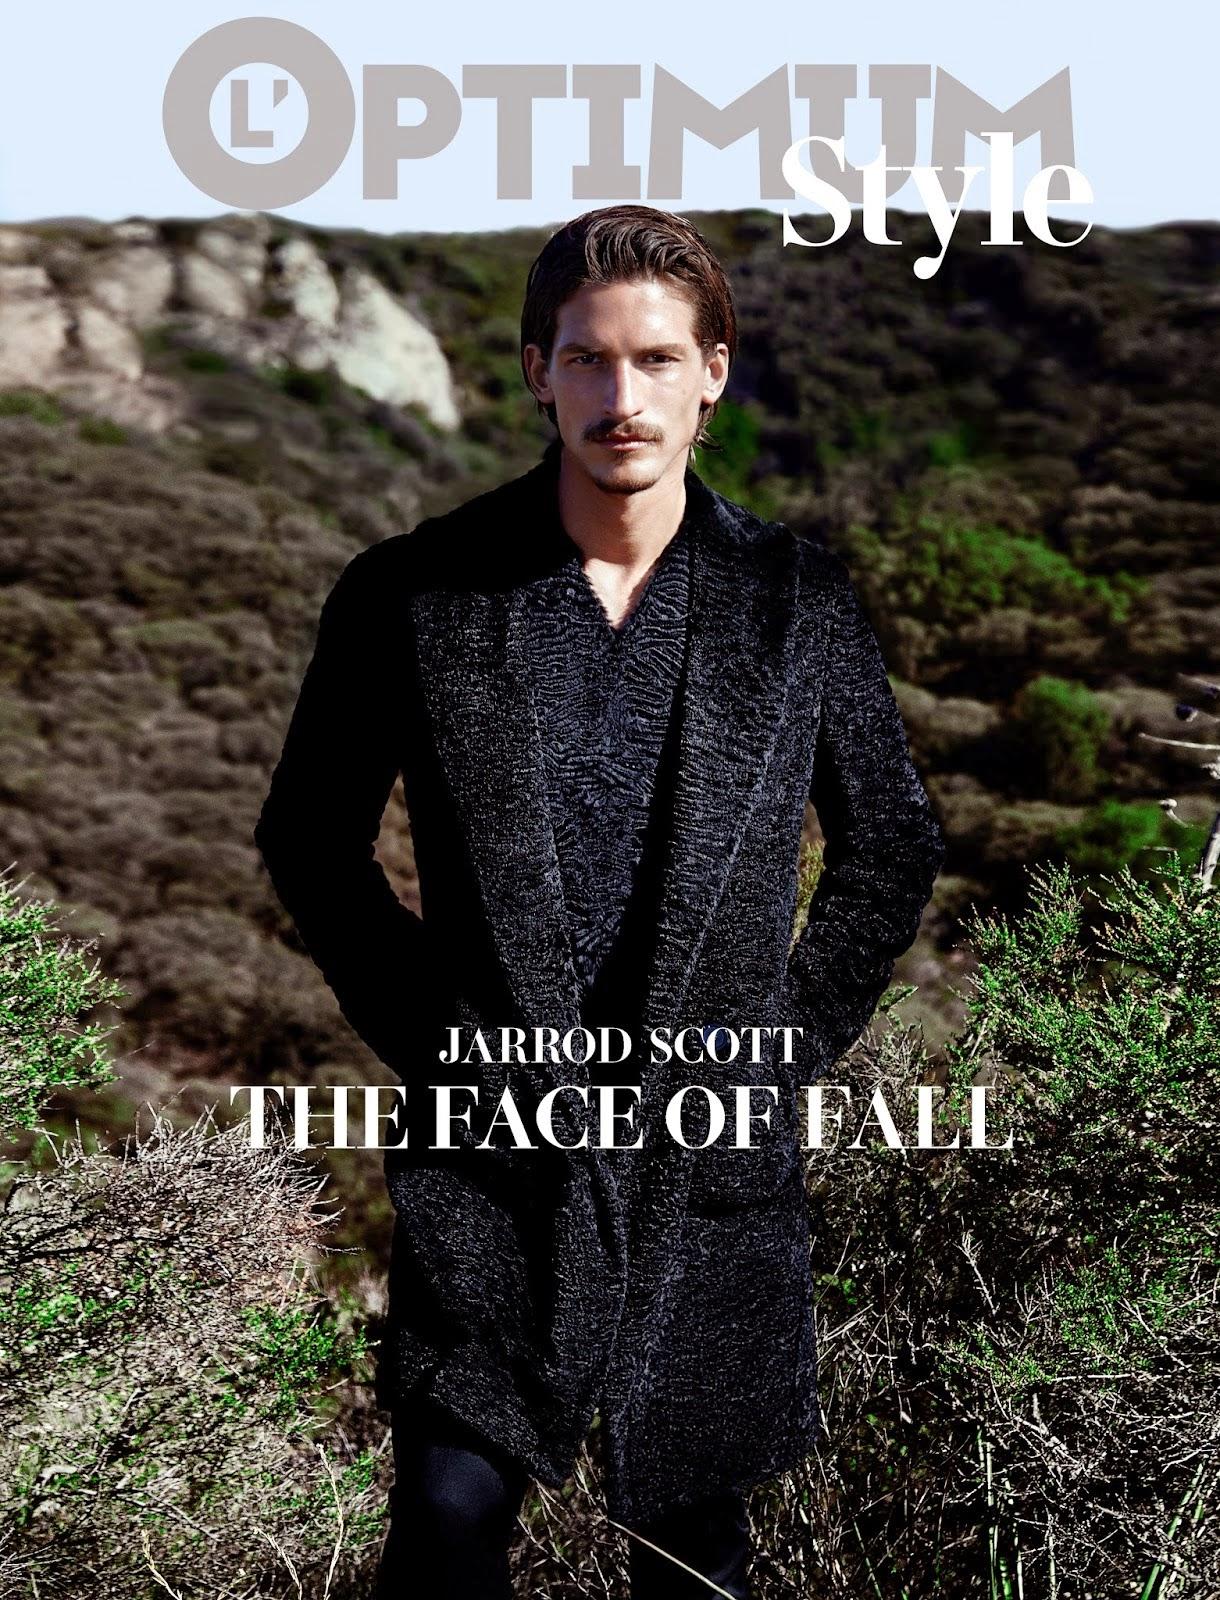 jarrod+scott